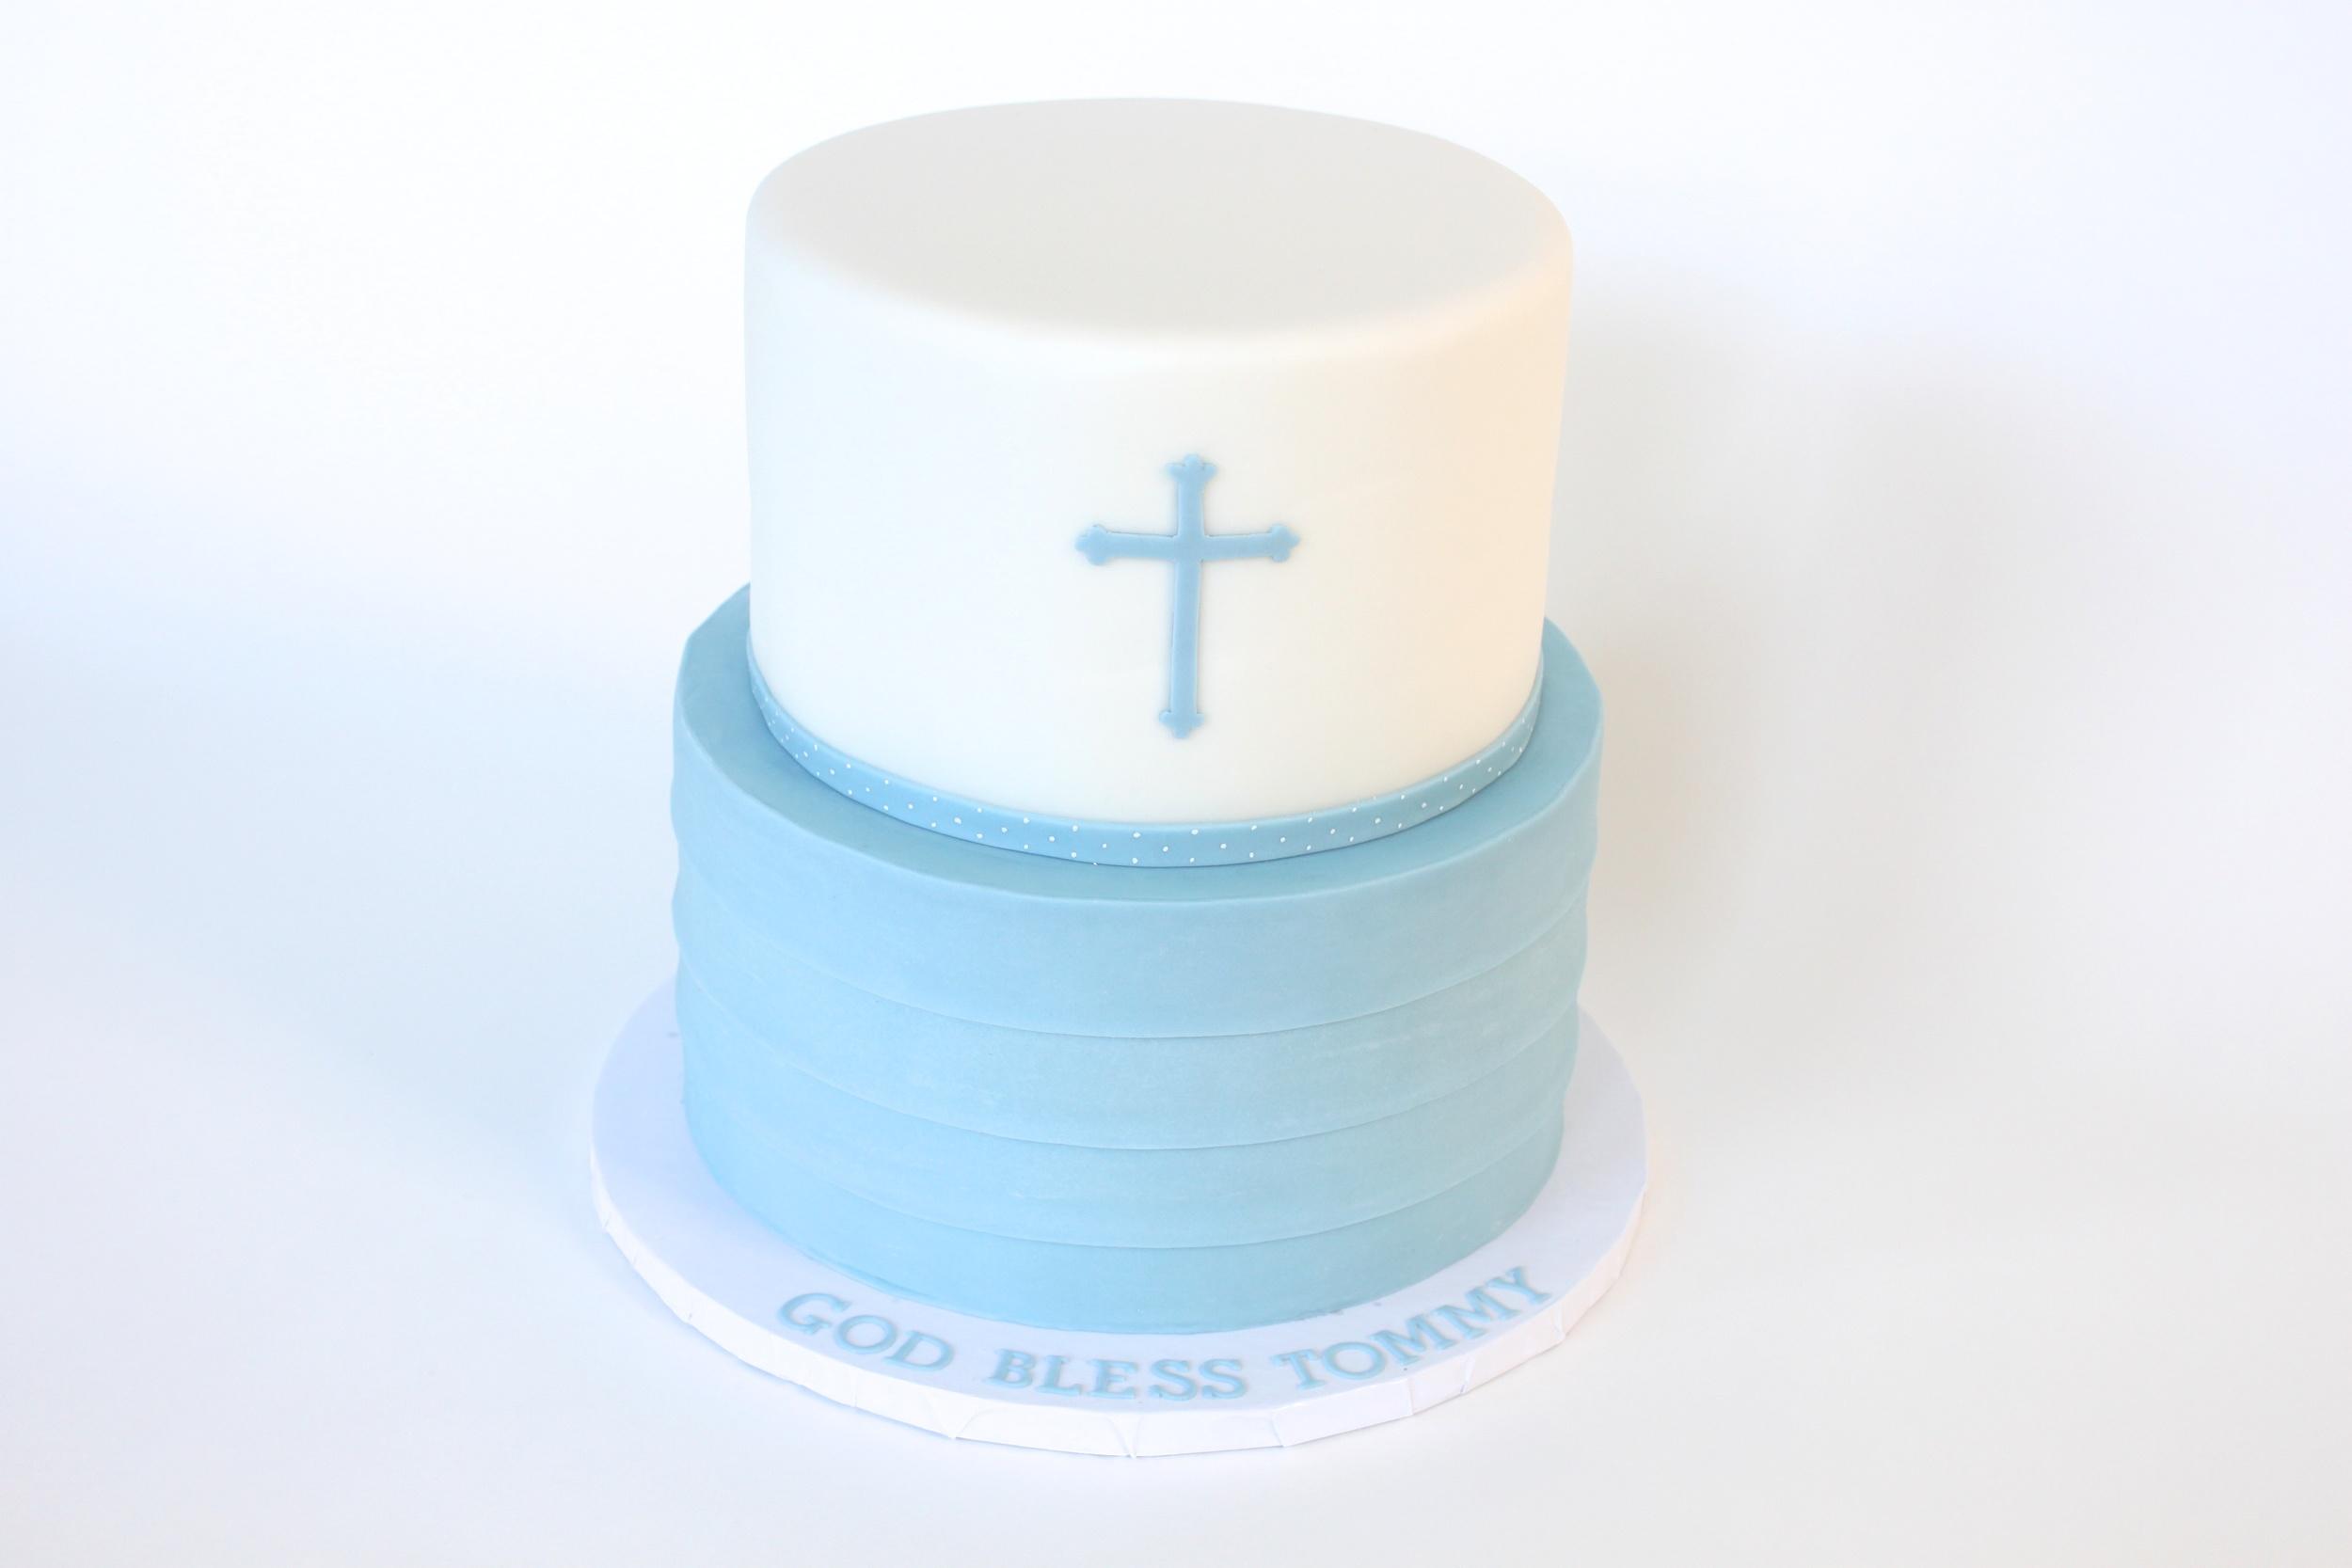 baptism cake horizontal 9942v2.jpg